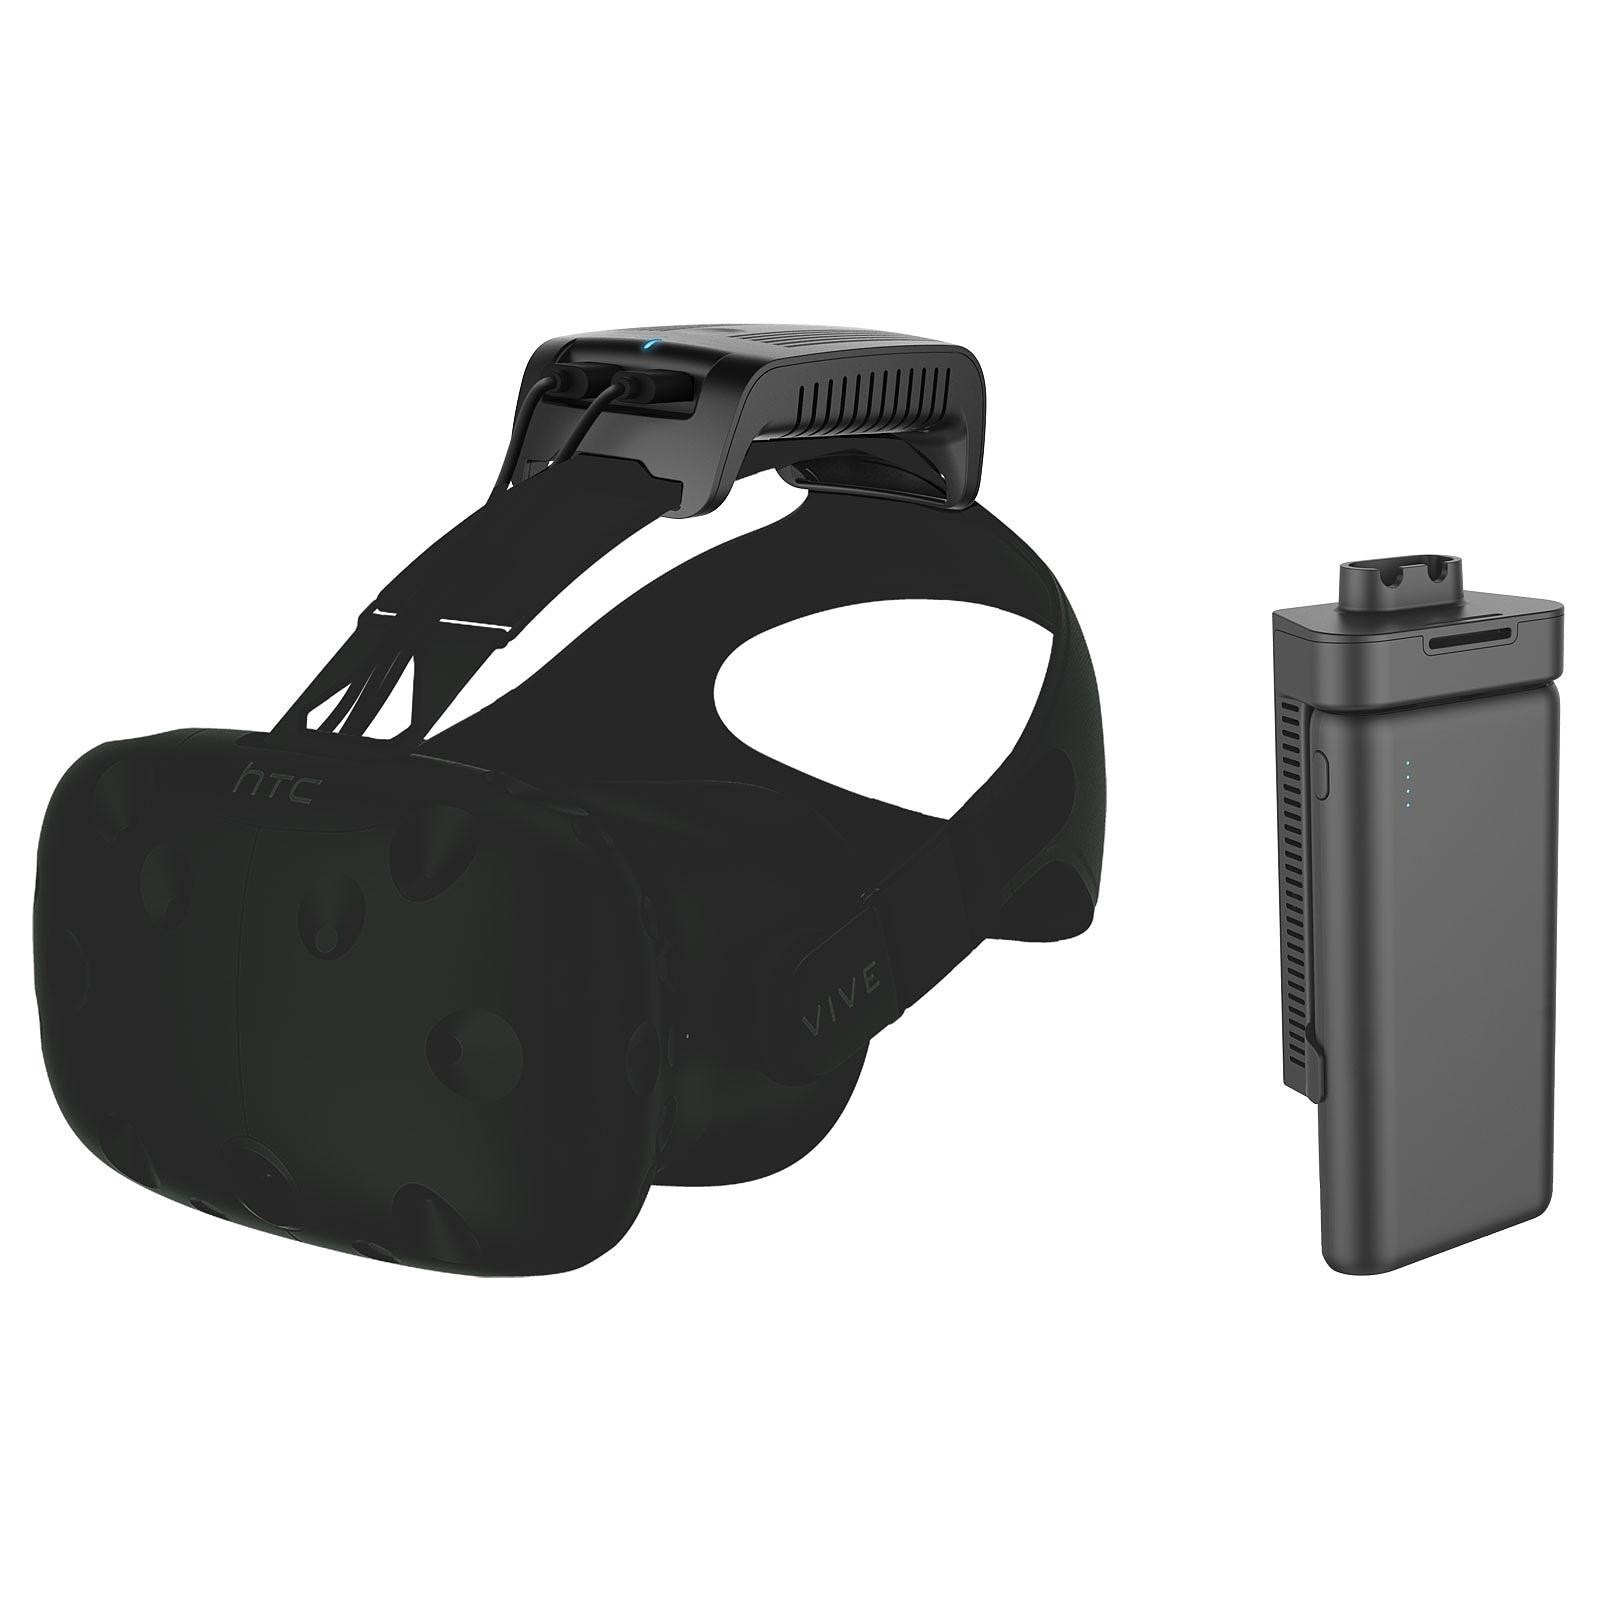 TPCAST Wireless Adaptor HTC Vive